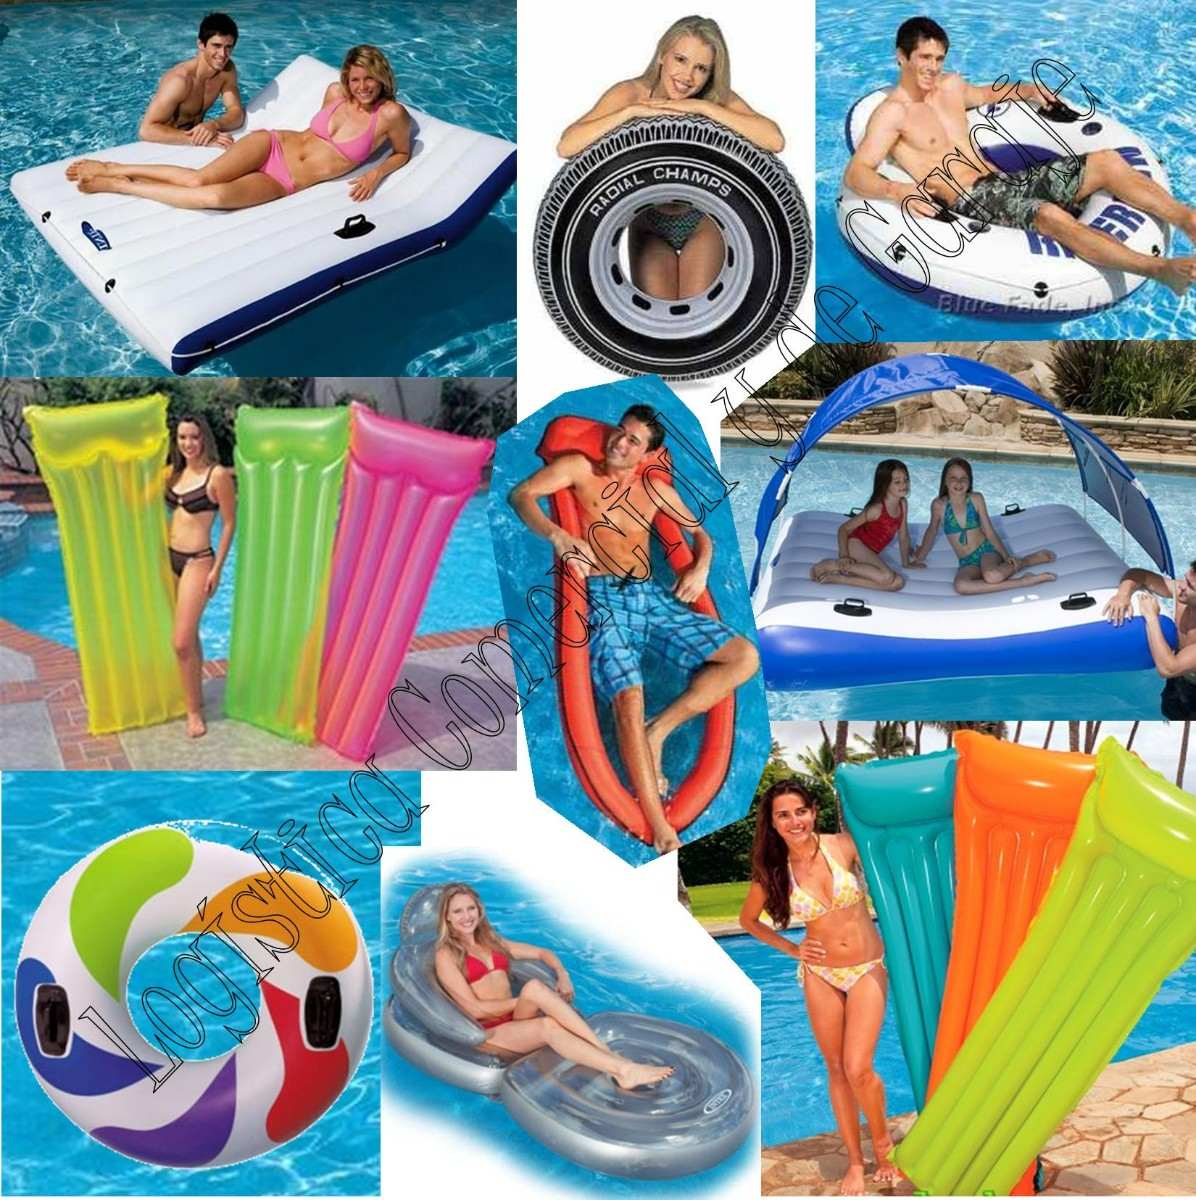 Colchon colchoneta inflable bestway tortuga 58279 playa for Colchonetas para piscina